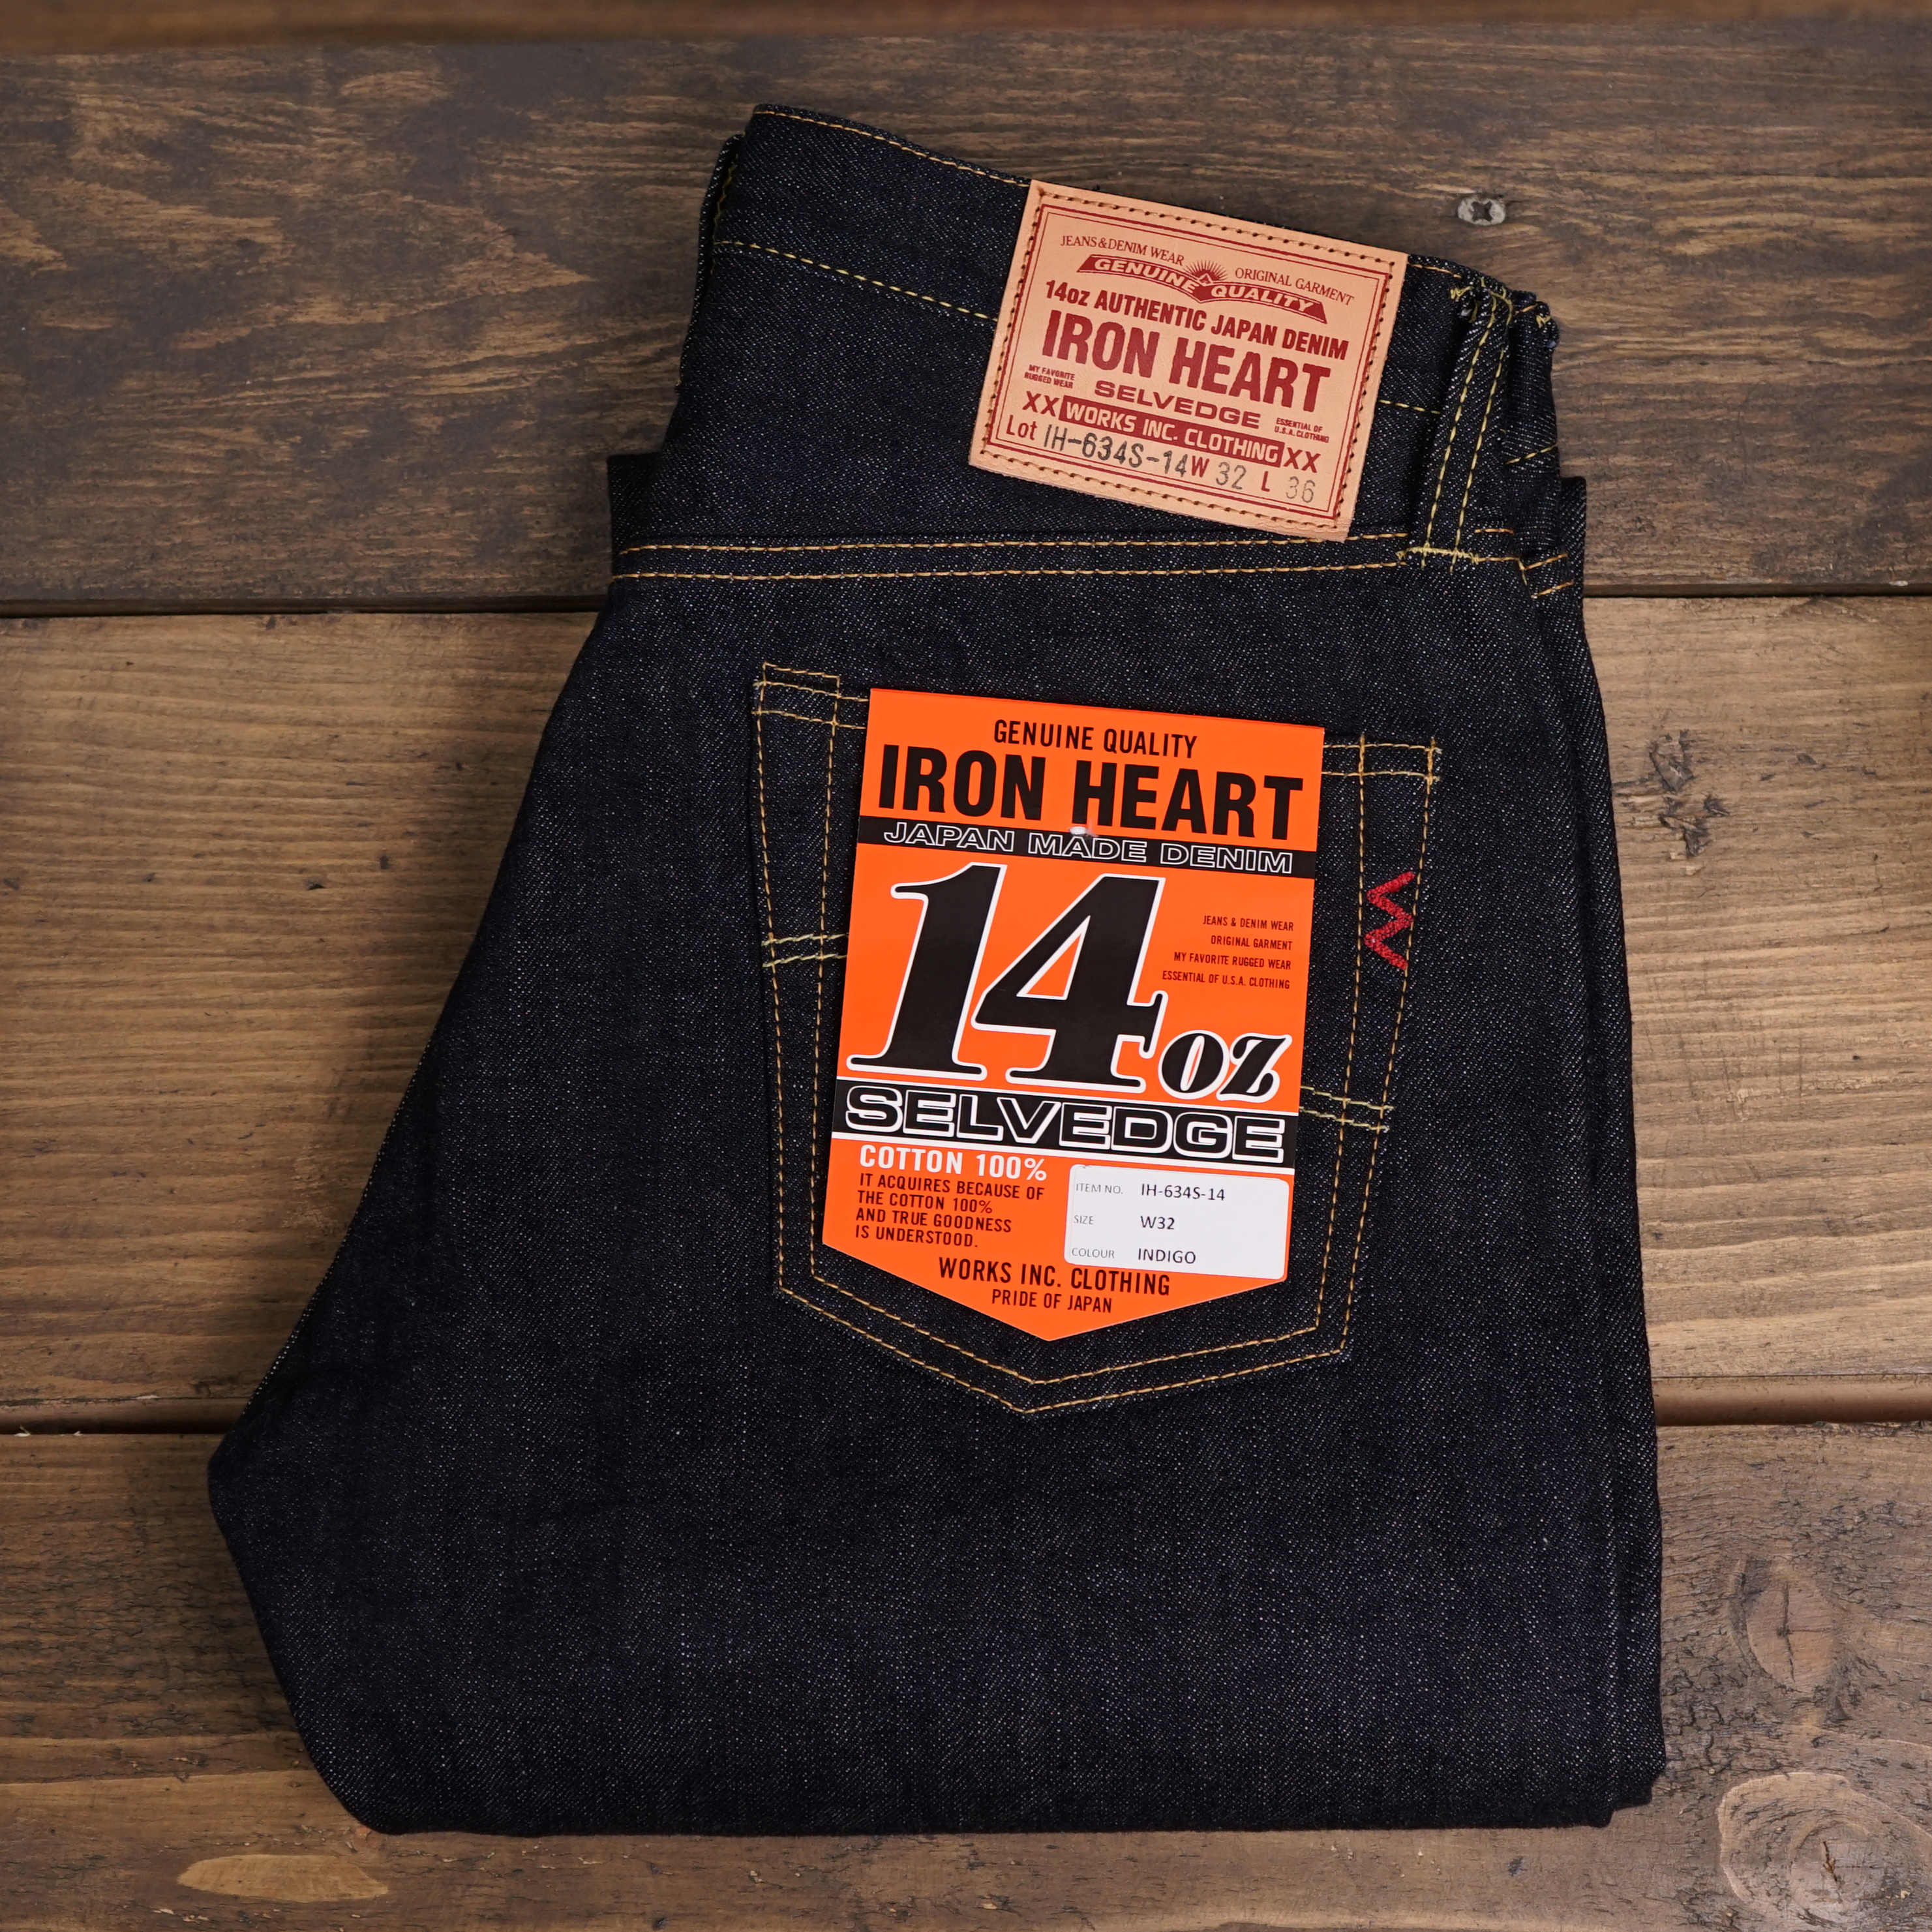 Iron heart IH-634S-14 oz Selvedge Denim Indigo